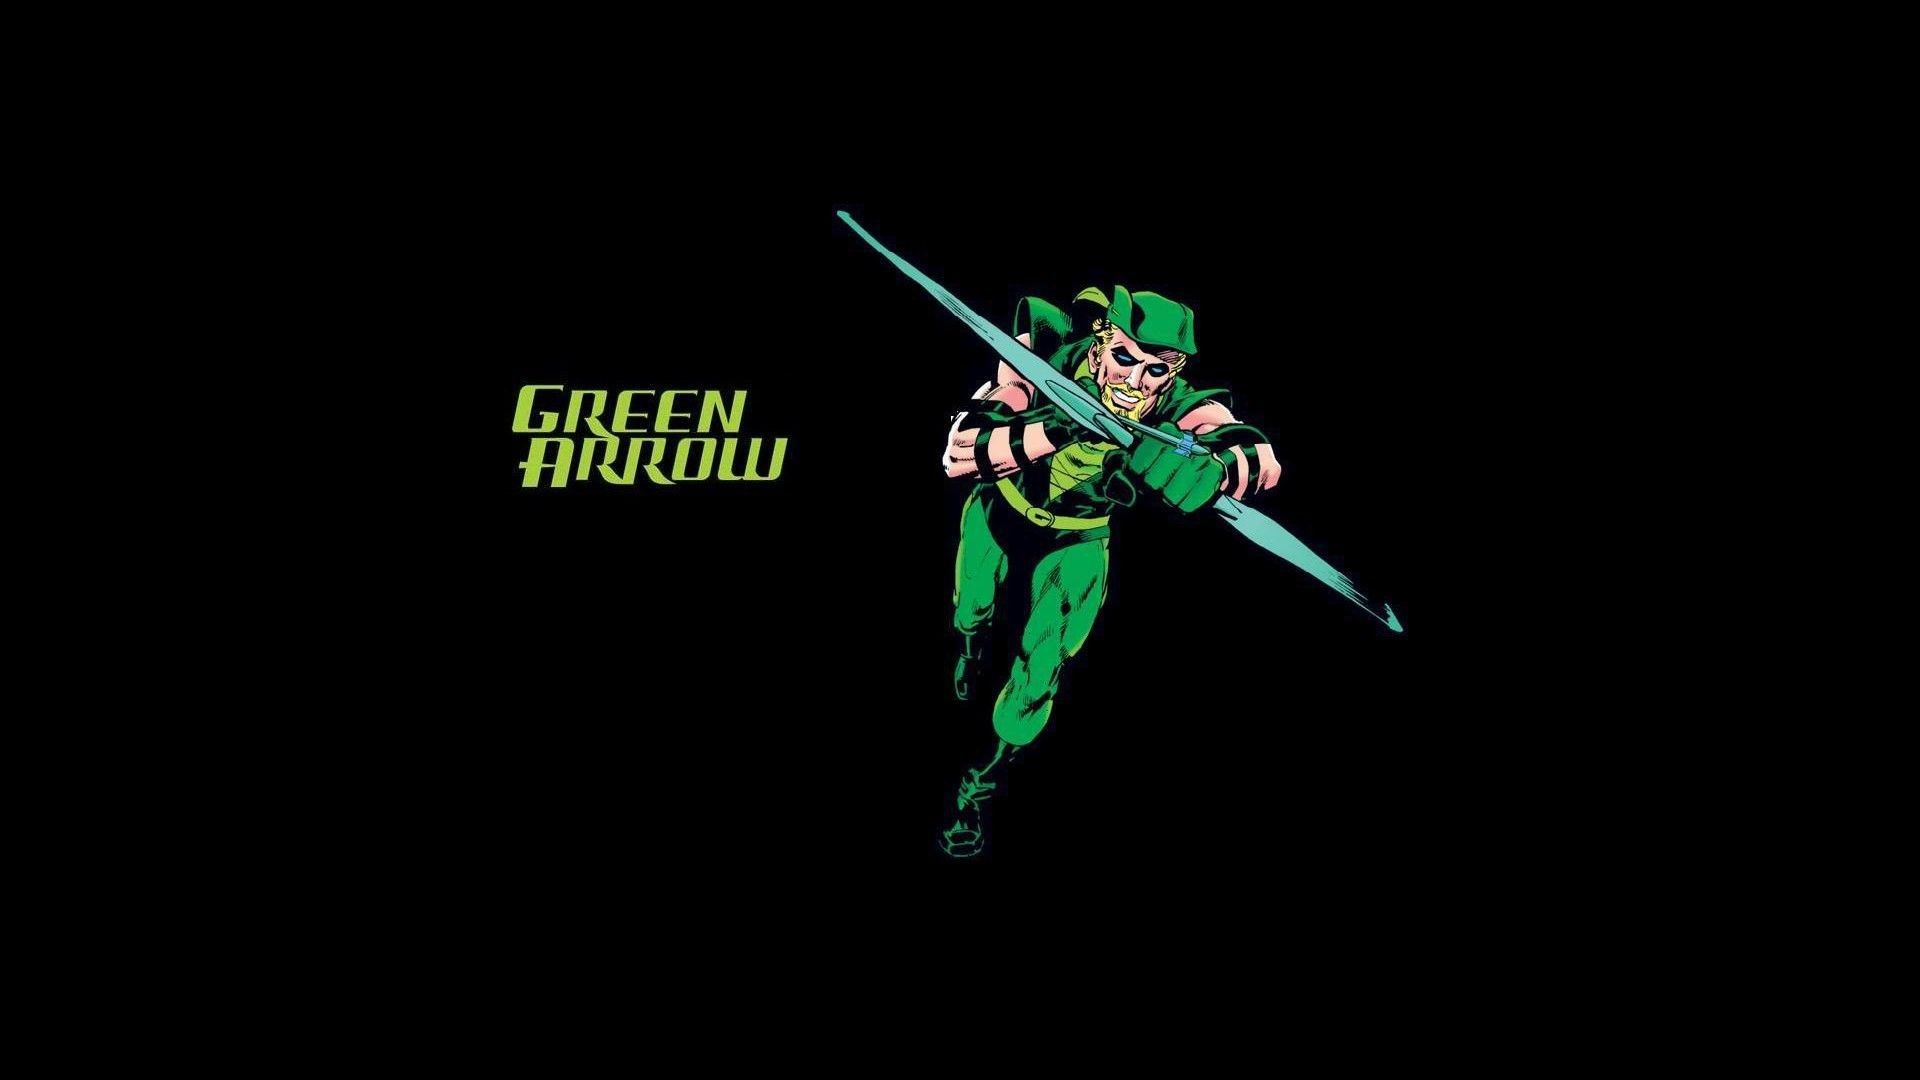 Green Arrow HD Wallpaper